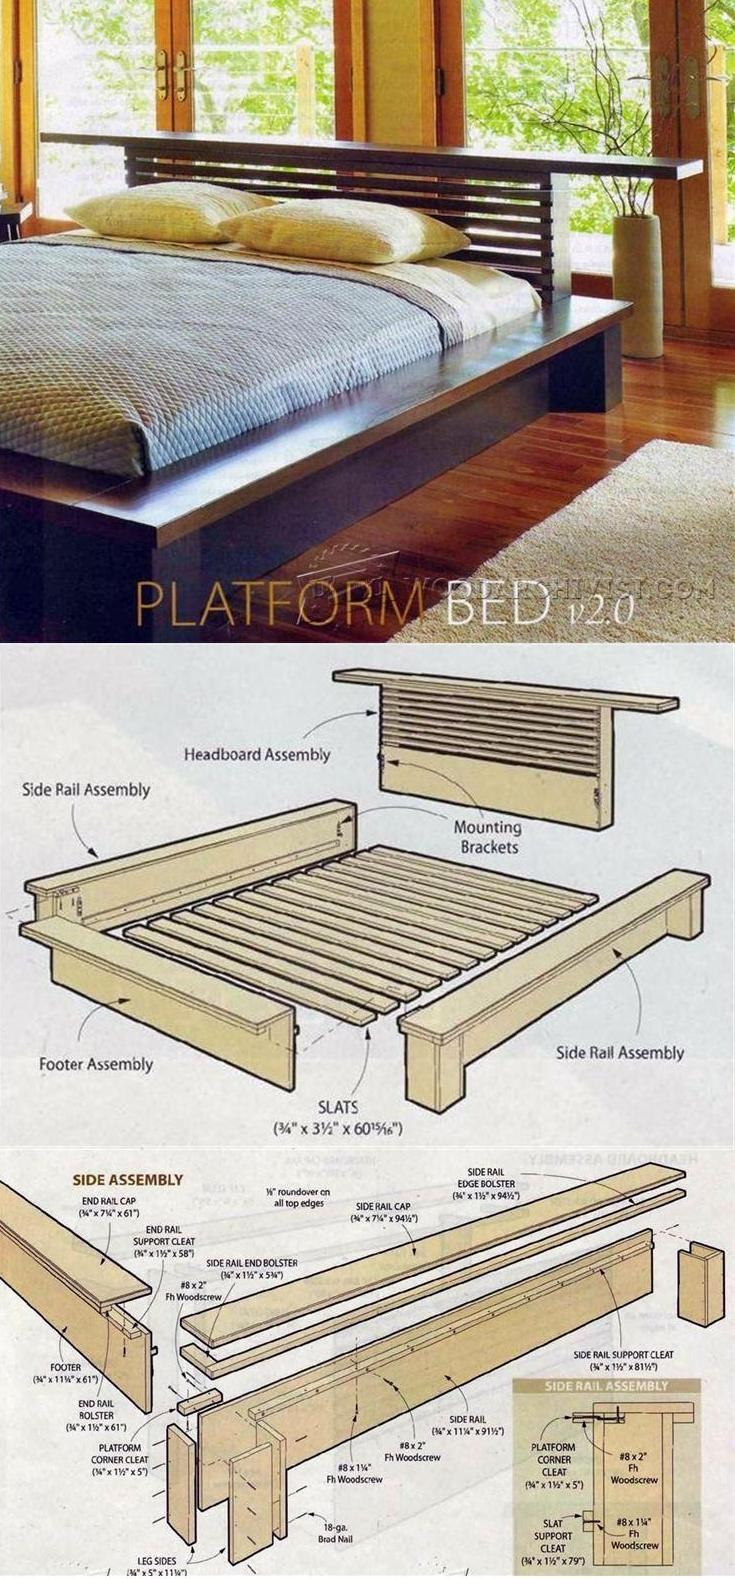 Bed frames with storage plans - Platform Bed Plans Furniture Plans And Projects Woodarchivist Com